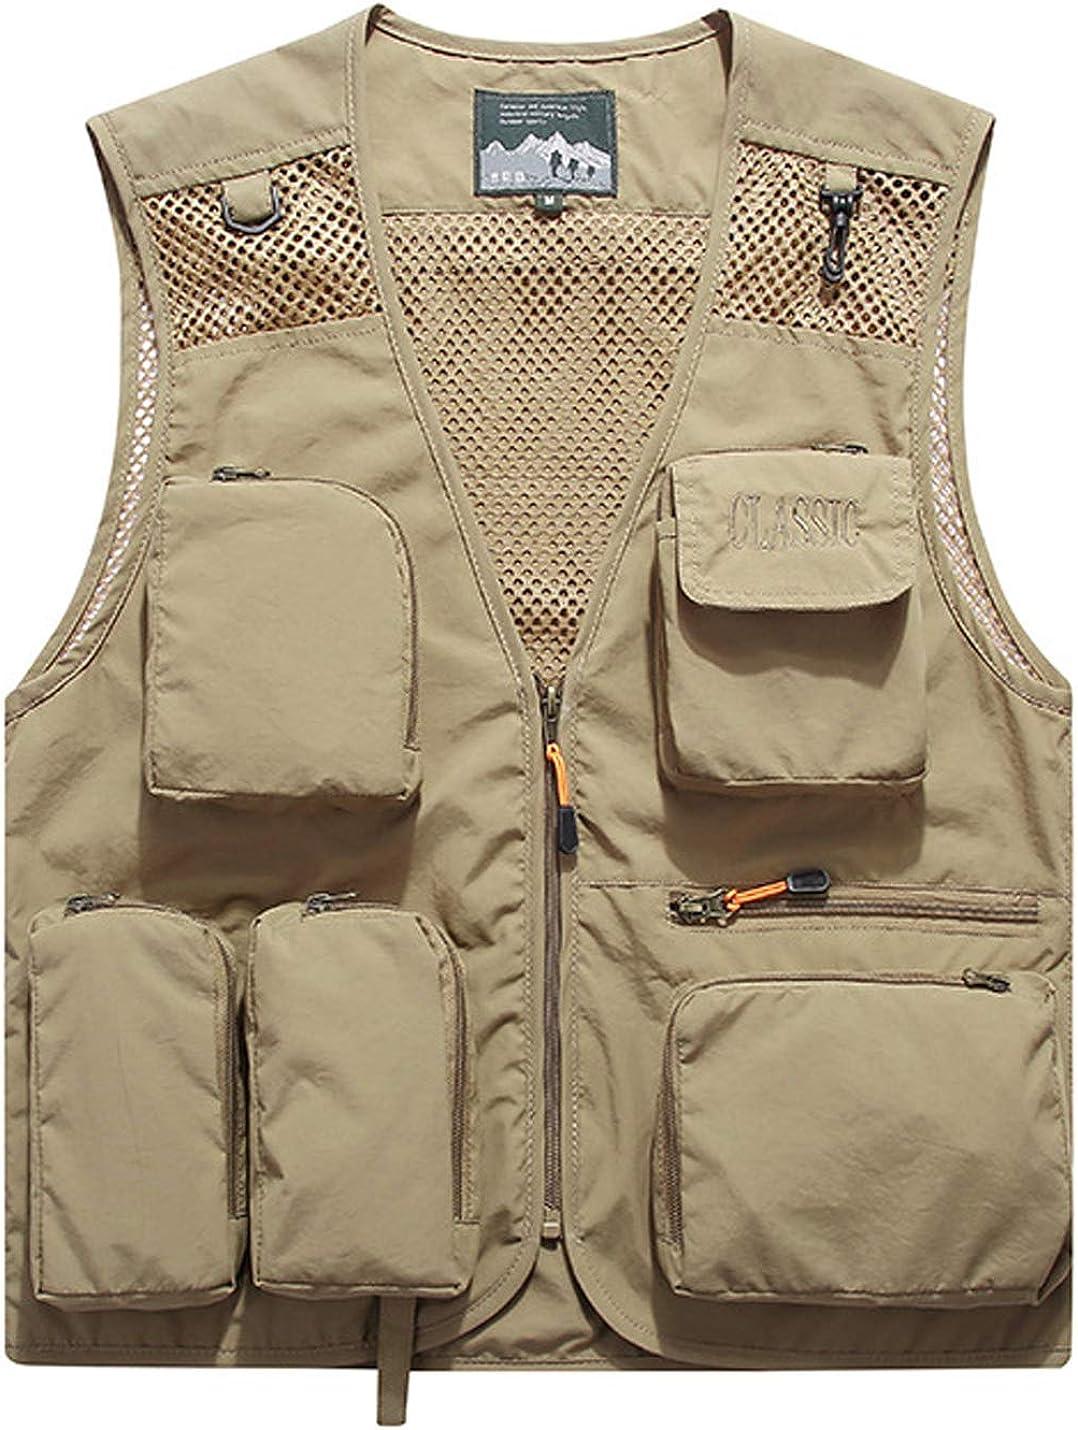 Yimoon Men's Outdoor Mesh Vest Fishing Travel Safari Quick-Dry Multi-Pocket Vest